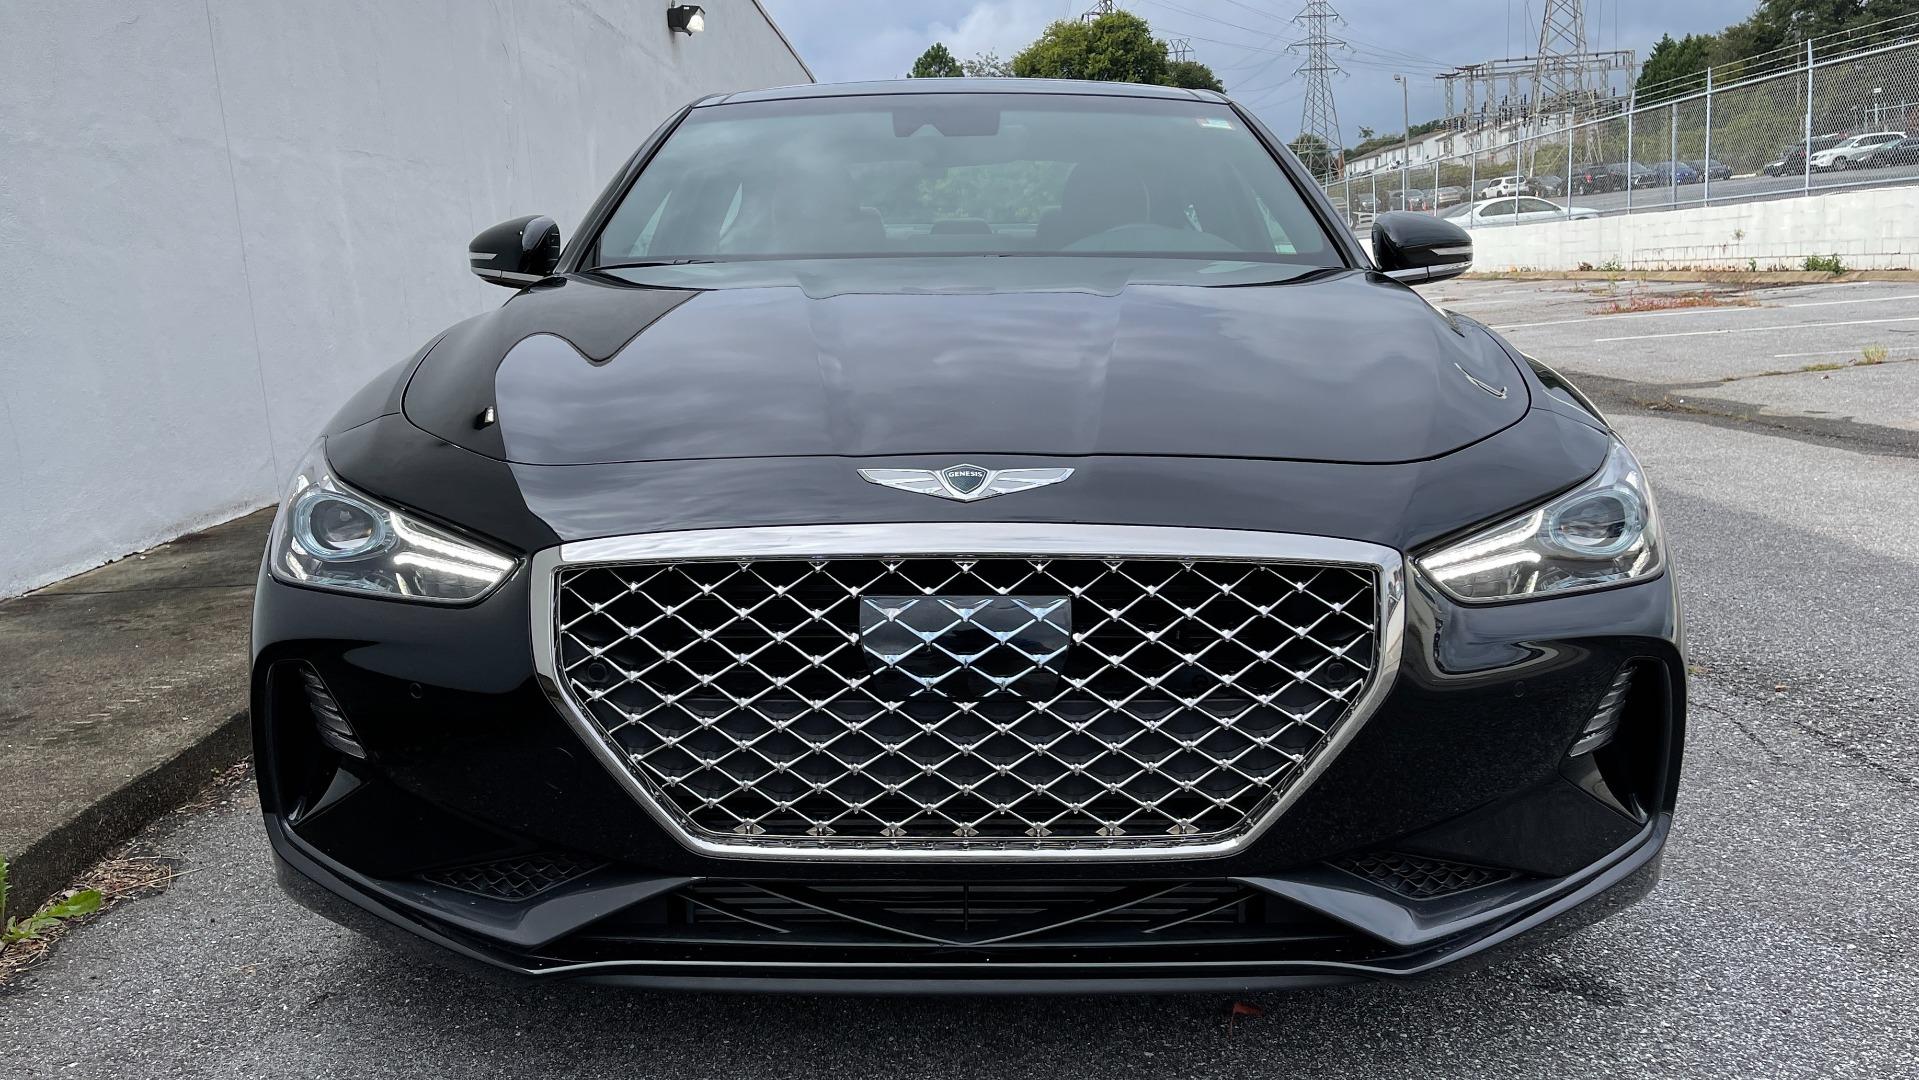 Used 2021 Genesis G70 ELITE 2.0T SEDAN / NAV / LANE ASST / BSA / SUNROOF / LEATHER / REARVIEW for sale $39,995 at Formula Imports in Charlotte NC 28227 7